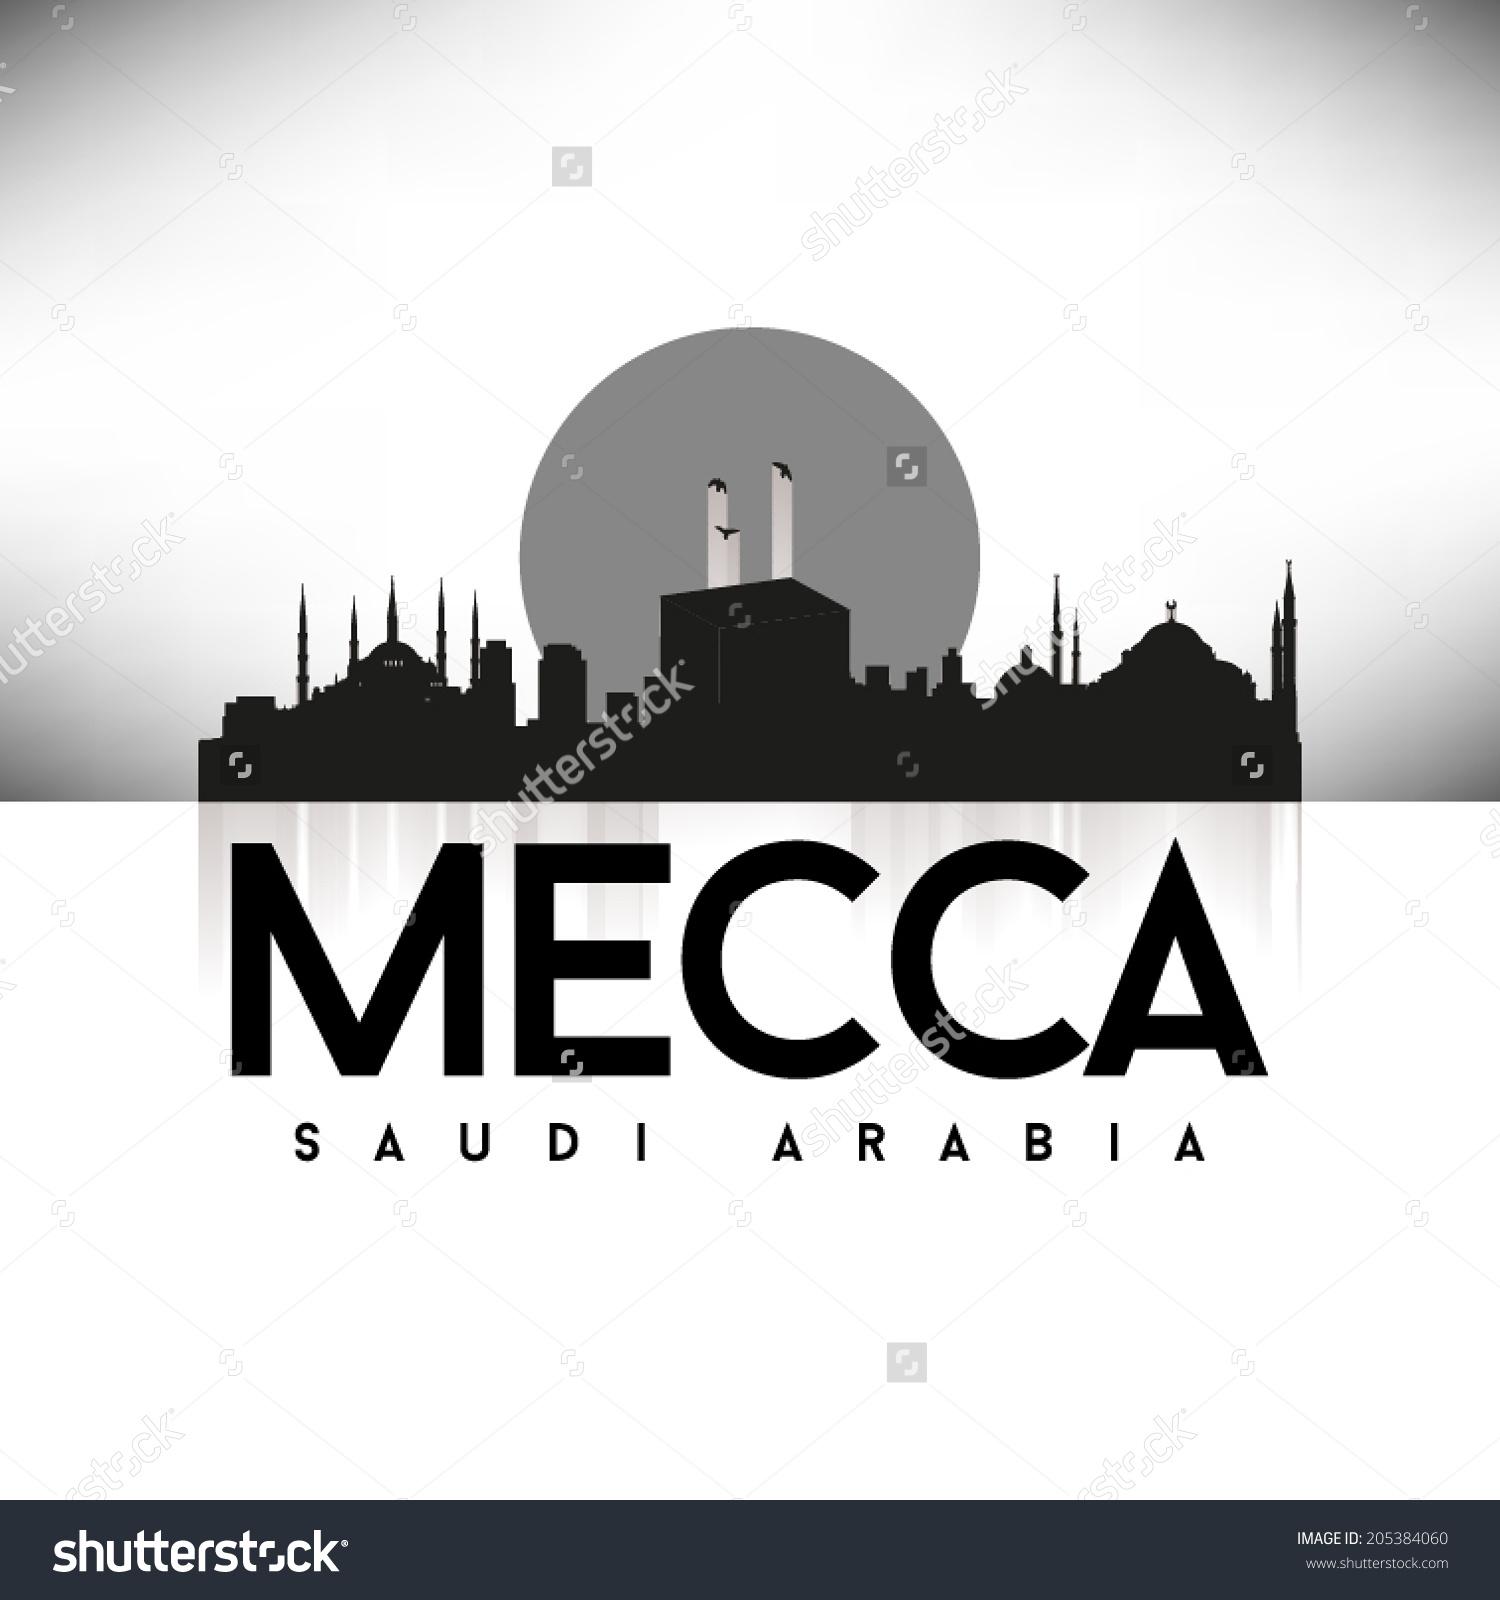 Mecca Saudi Arabia Black Skyline Design Stock Vector 205384060.